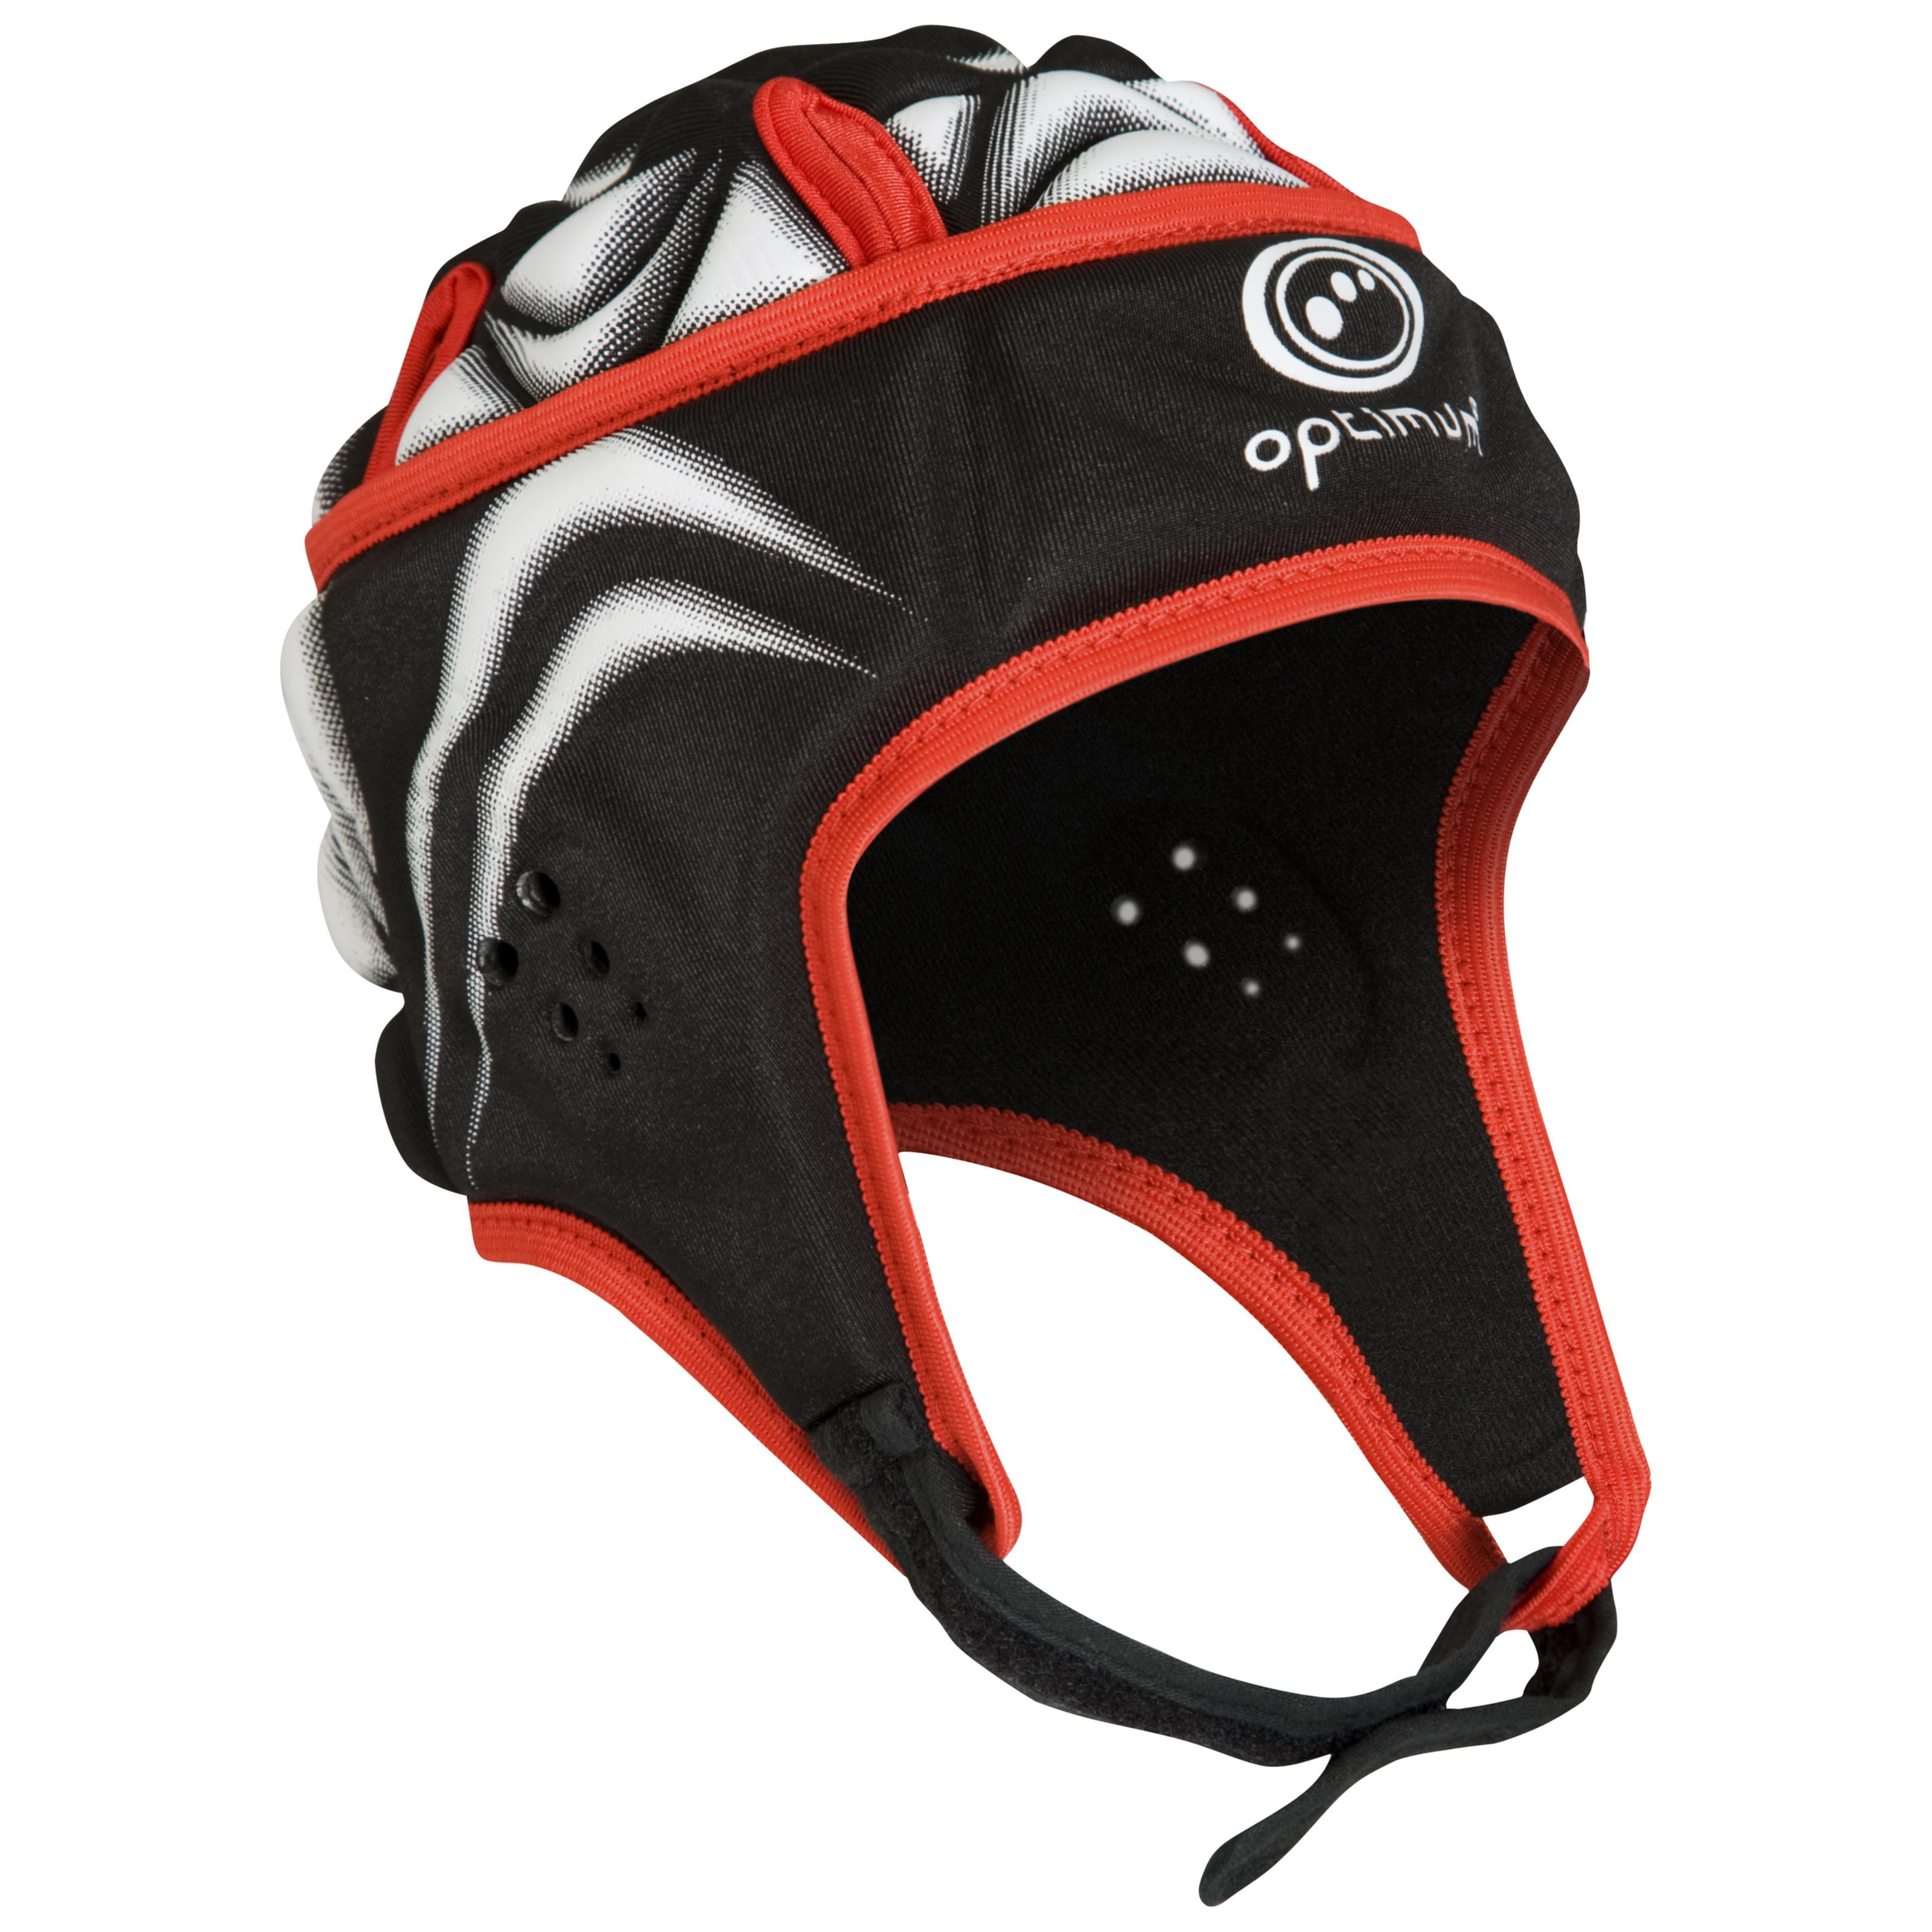 Optimum Blitz Extreme Headguard - Black/Red/White - Boys